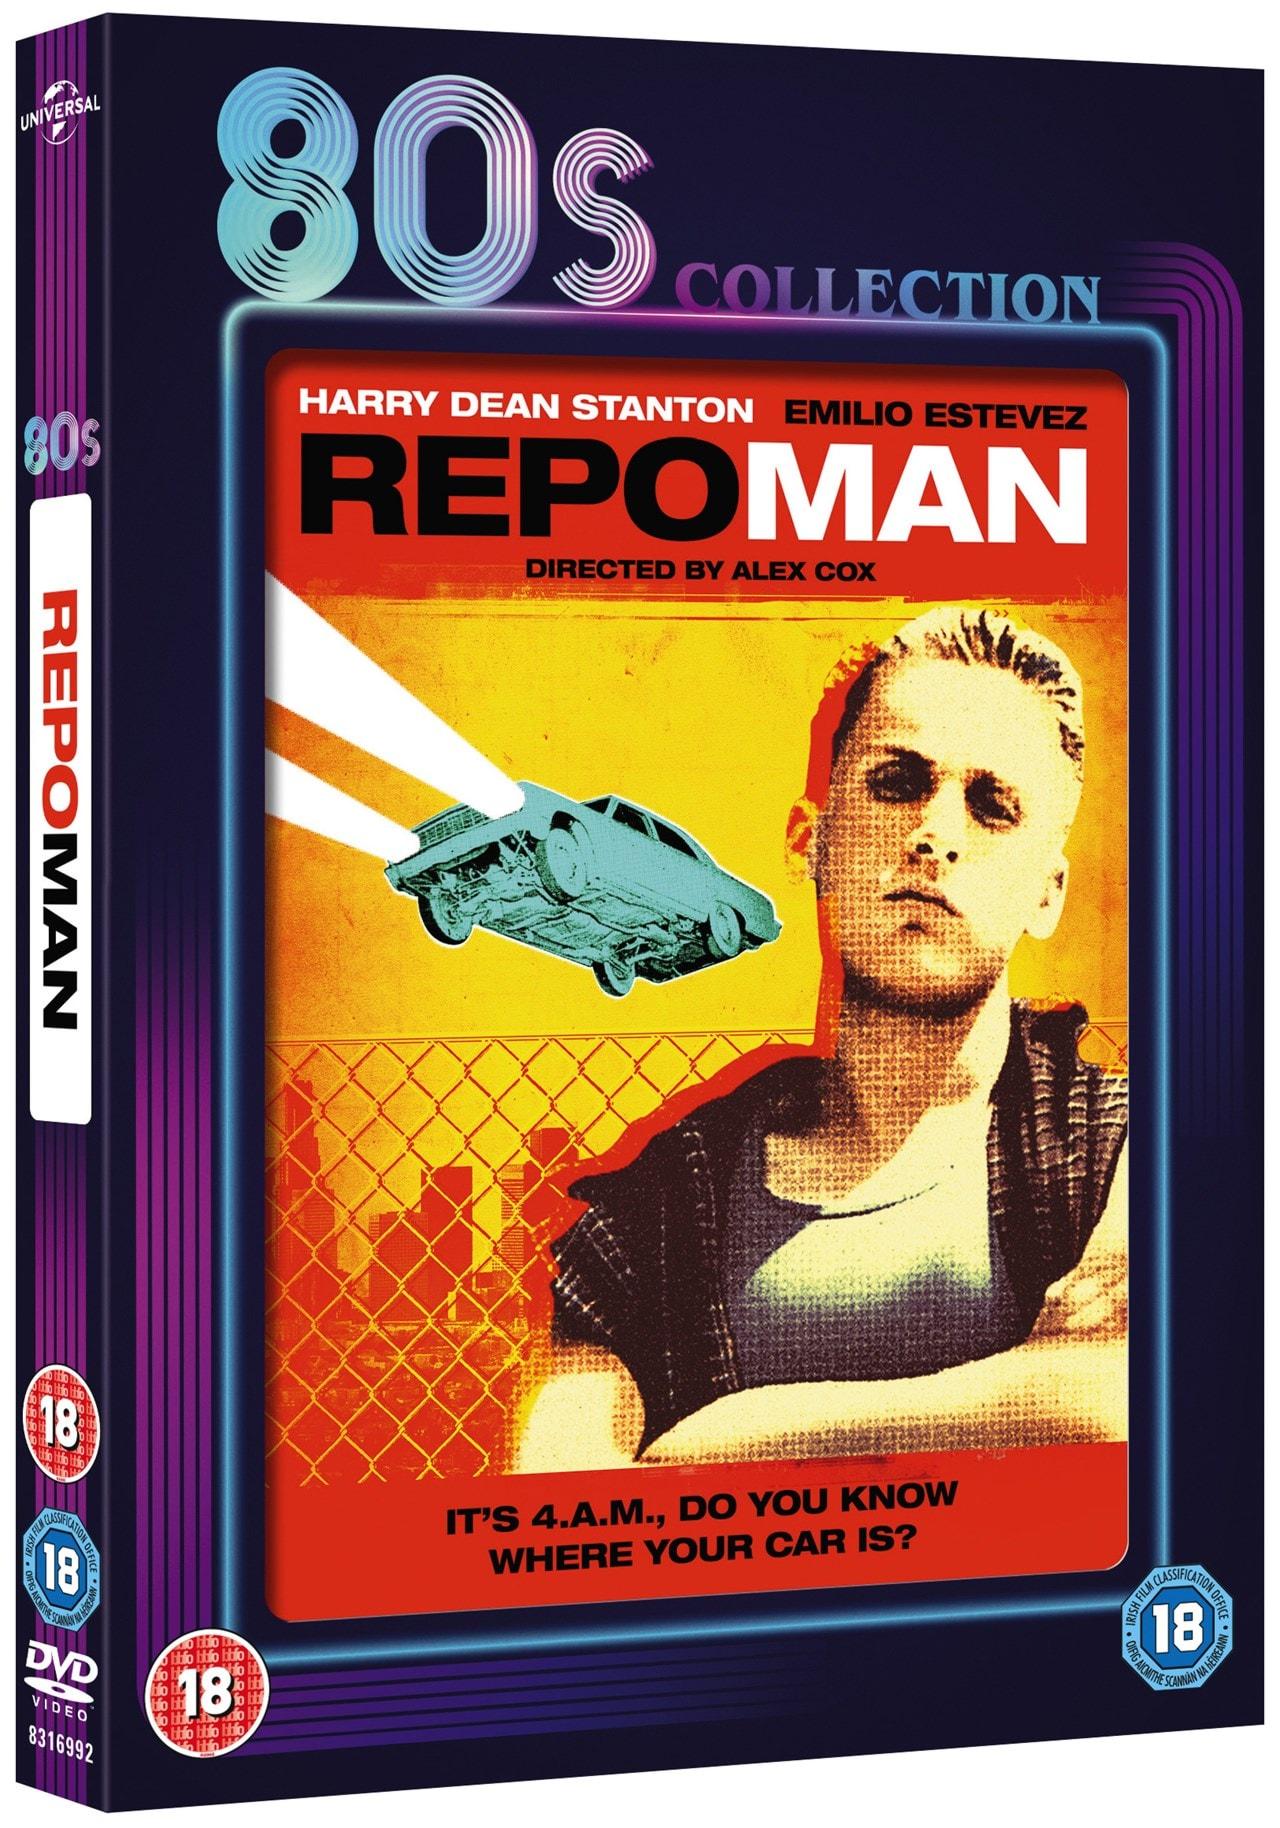 Repo Man - 80s Collection - 2